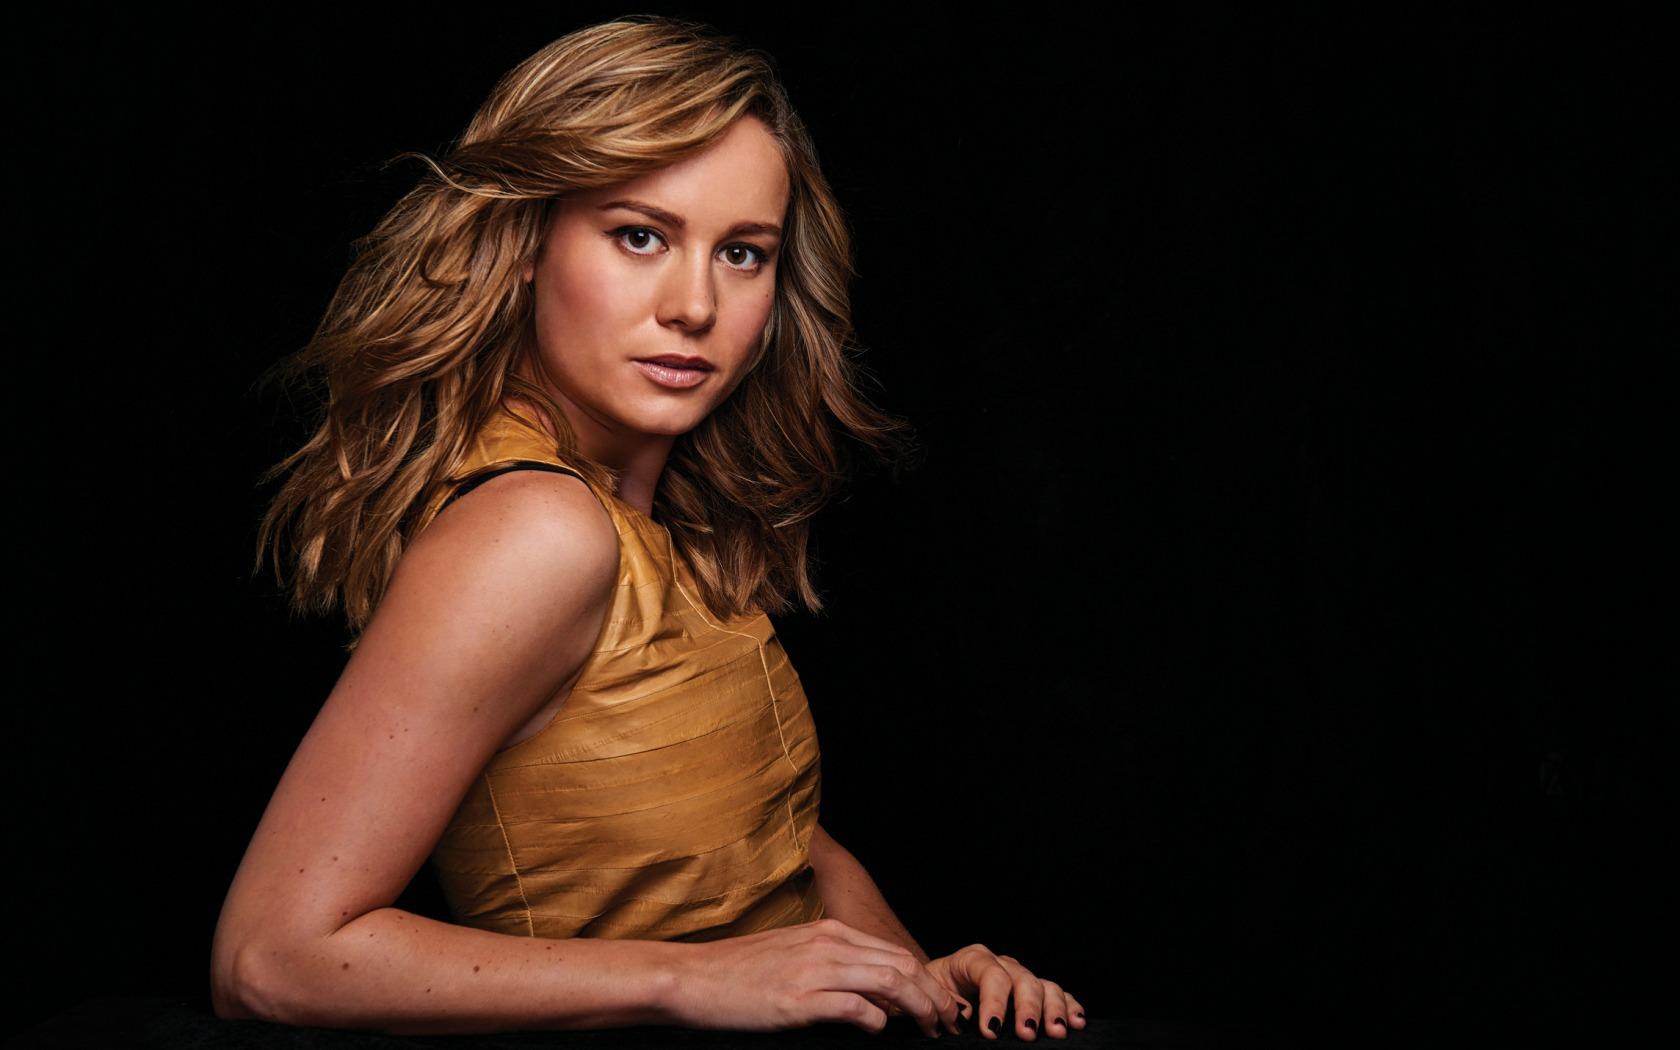 Brie Larson Pictures